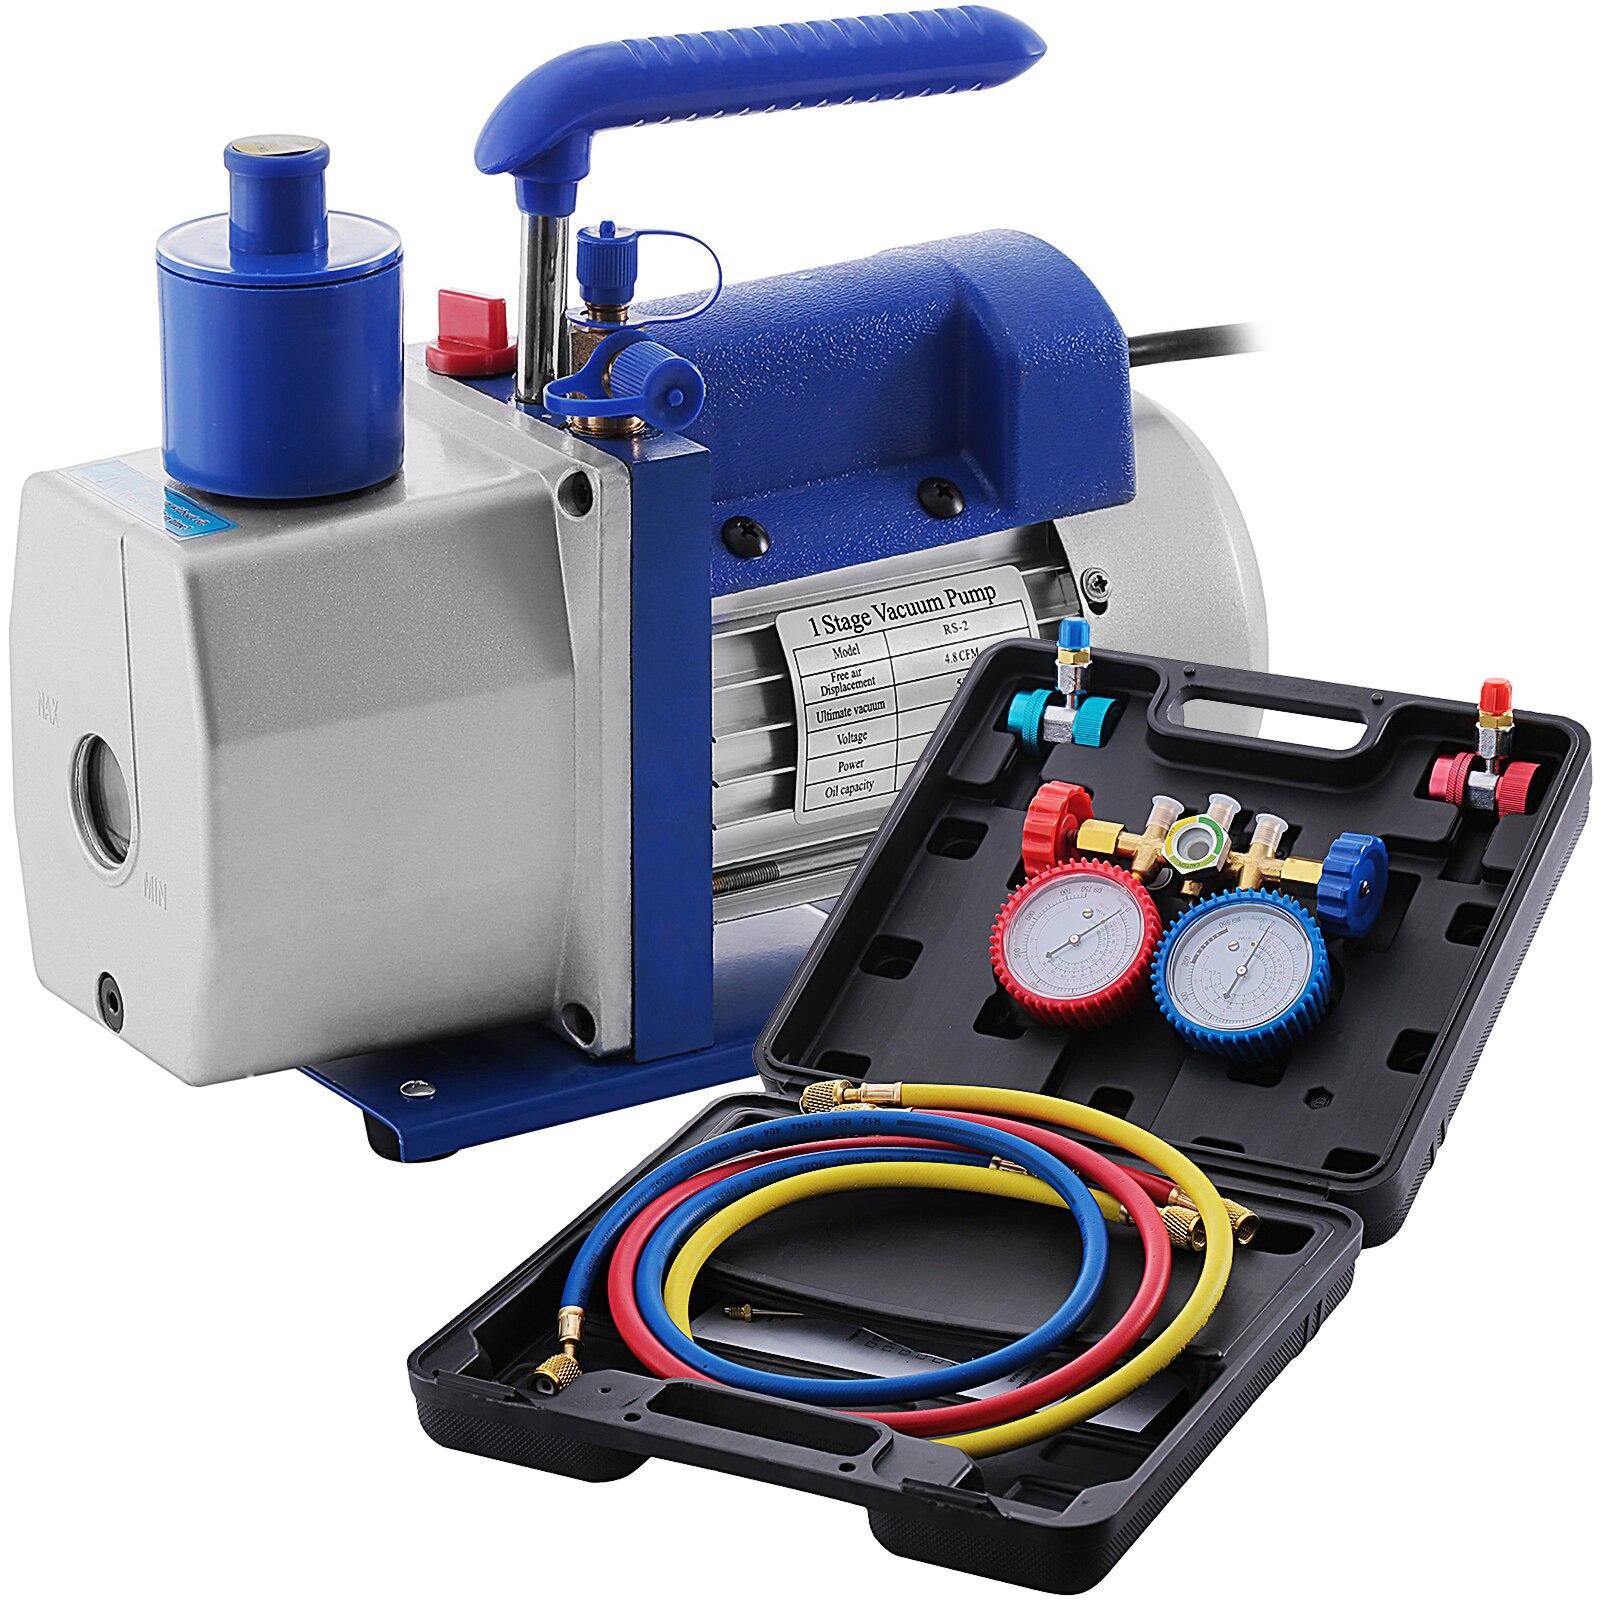 VEVOR 4.8CFM 1/3HP مضخة تفريغ دوارة + 4 صمام مجموعة قياس متعددة ، HVAC المبردات تكييف الهواء R22 R134A R410A